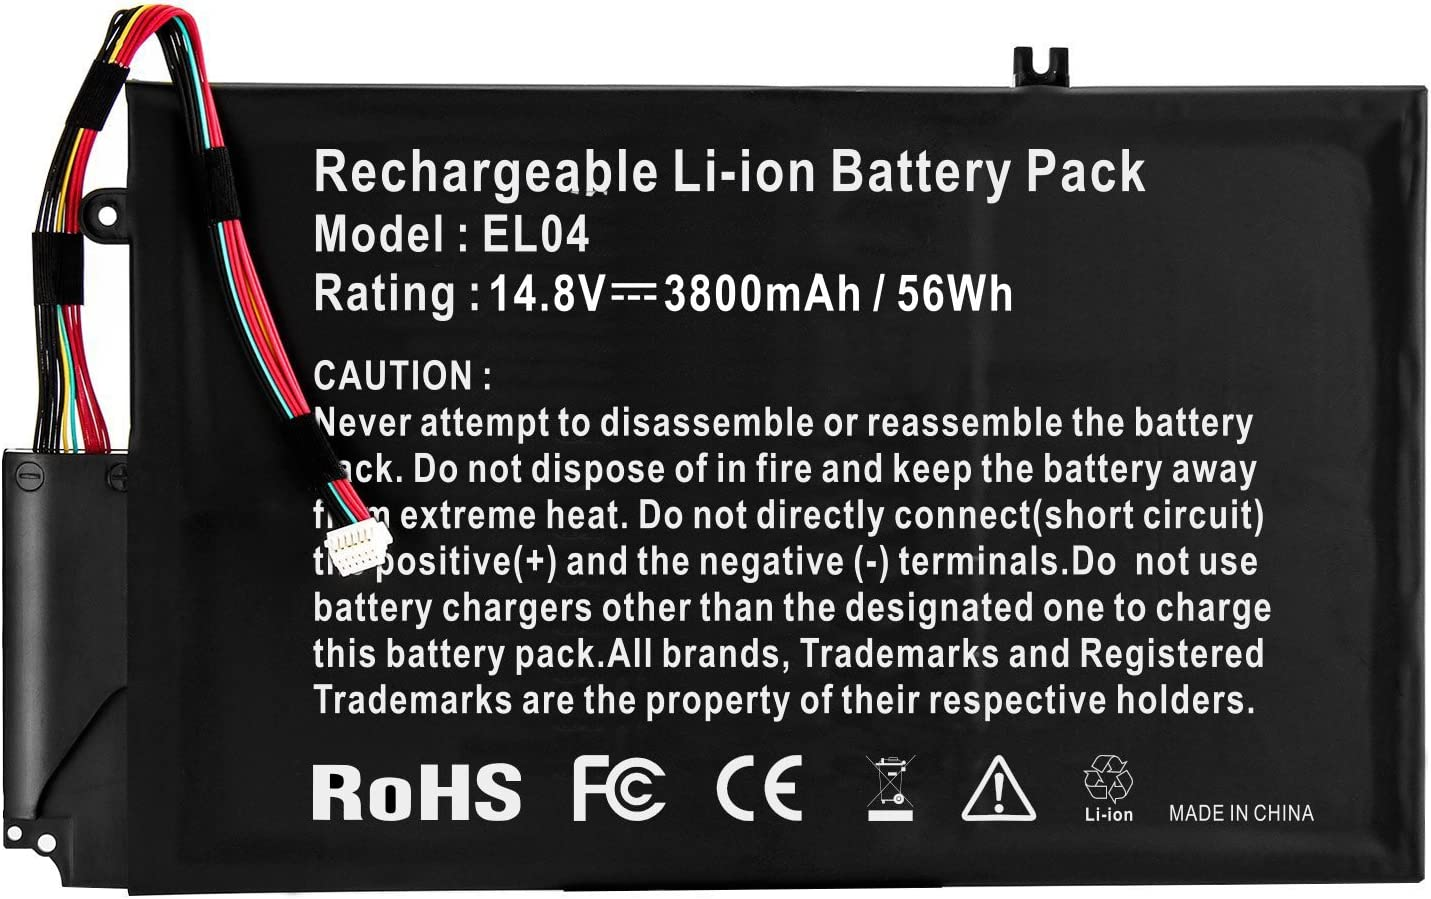 ARyee 3800mAh 14.8V EL04 Battery Laptop Battery Replacement for HP Envy 4-1000 Envy 4-1100 Envy 4-1200 HP 4-1000 4-1100 4-1200 4-1043CL HSTNN-IB3R 681879-1C1 681949-001 HSTNN-UB3R 681879-171 681879-54